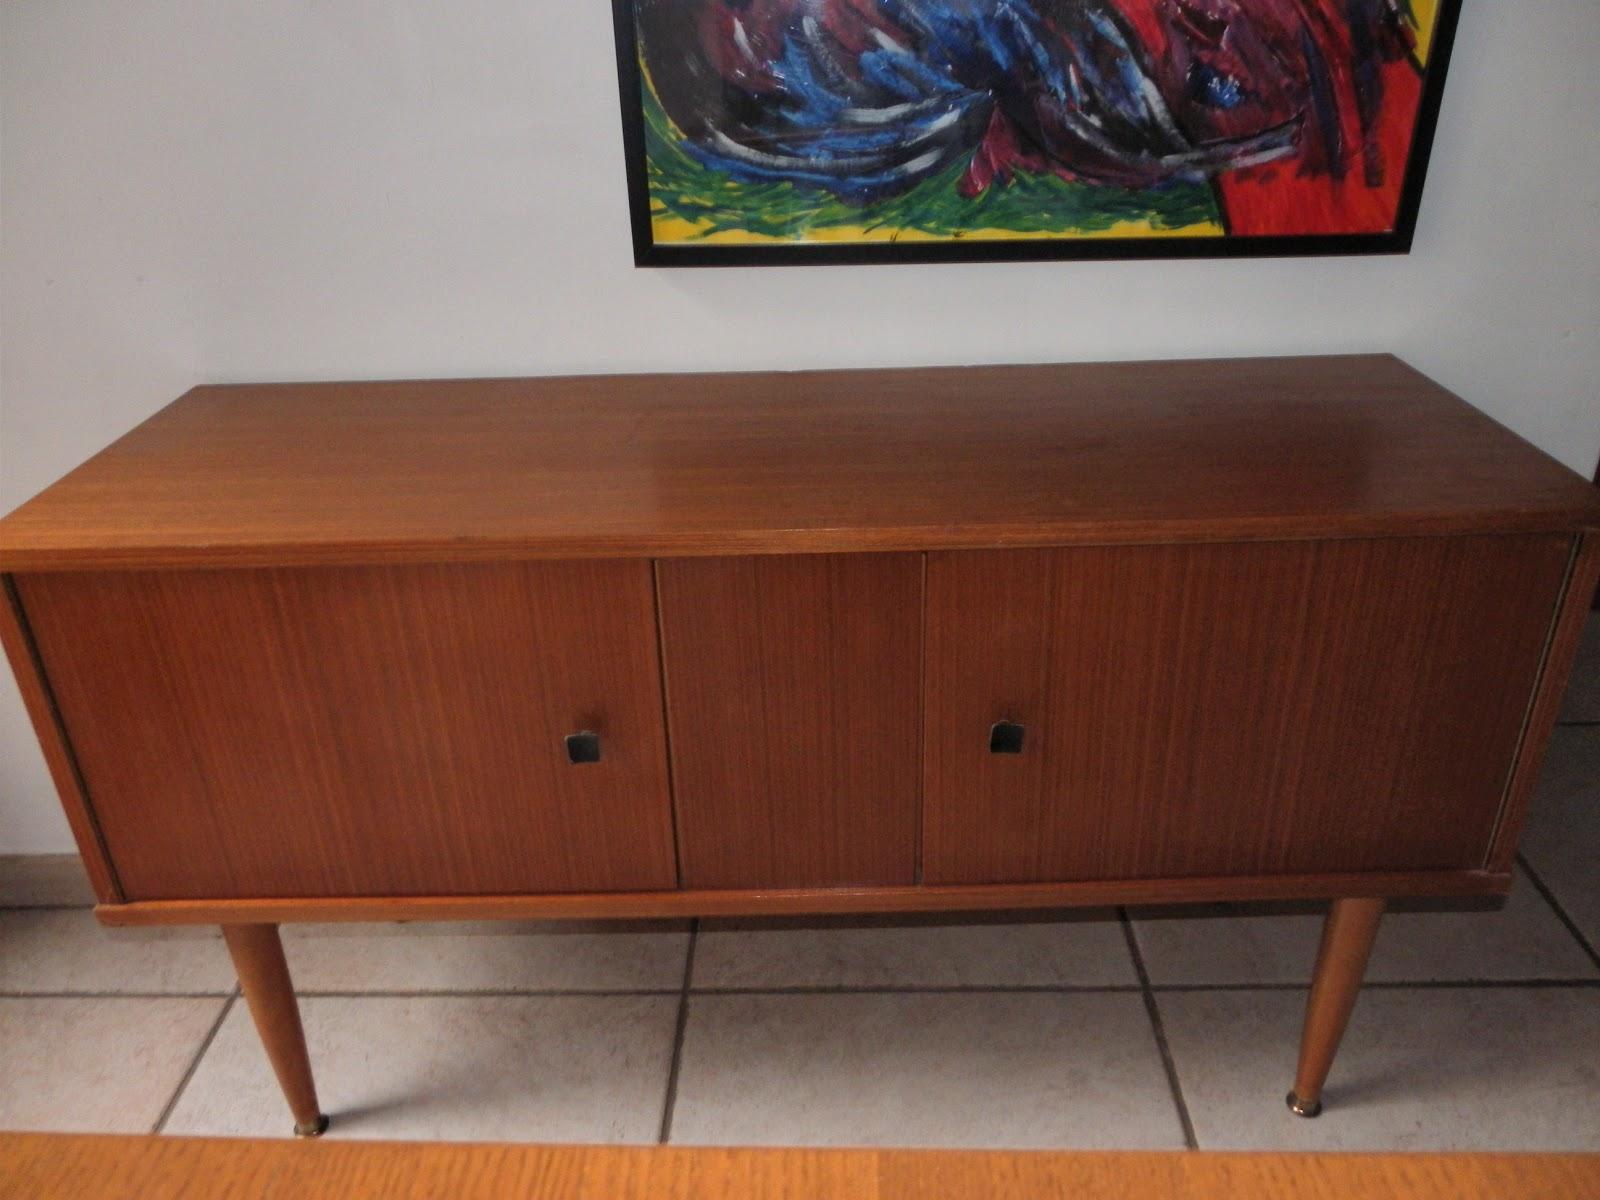 lucie la chineuse meuble bas style scandinave ann e 60. Black Bedroom Furniture Sets. Home Design Ideas